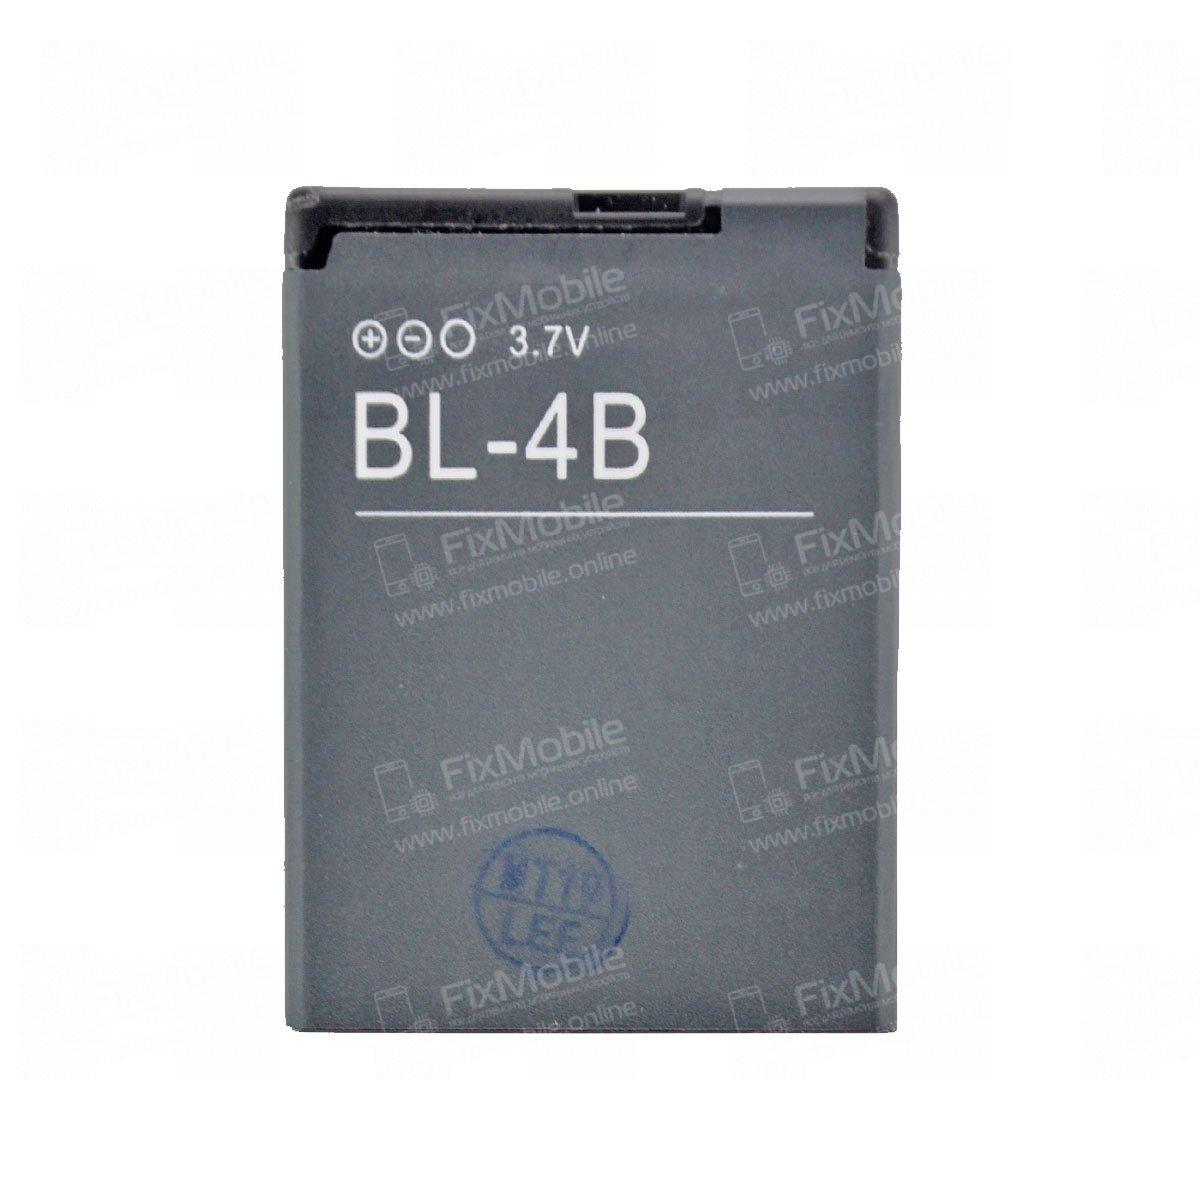 Аккумуляторная батарея для Nokia 6111 BL-4B